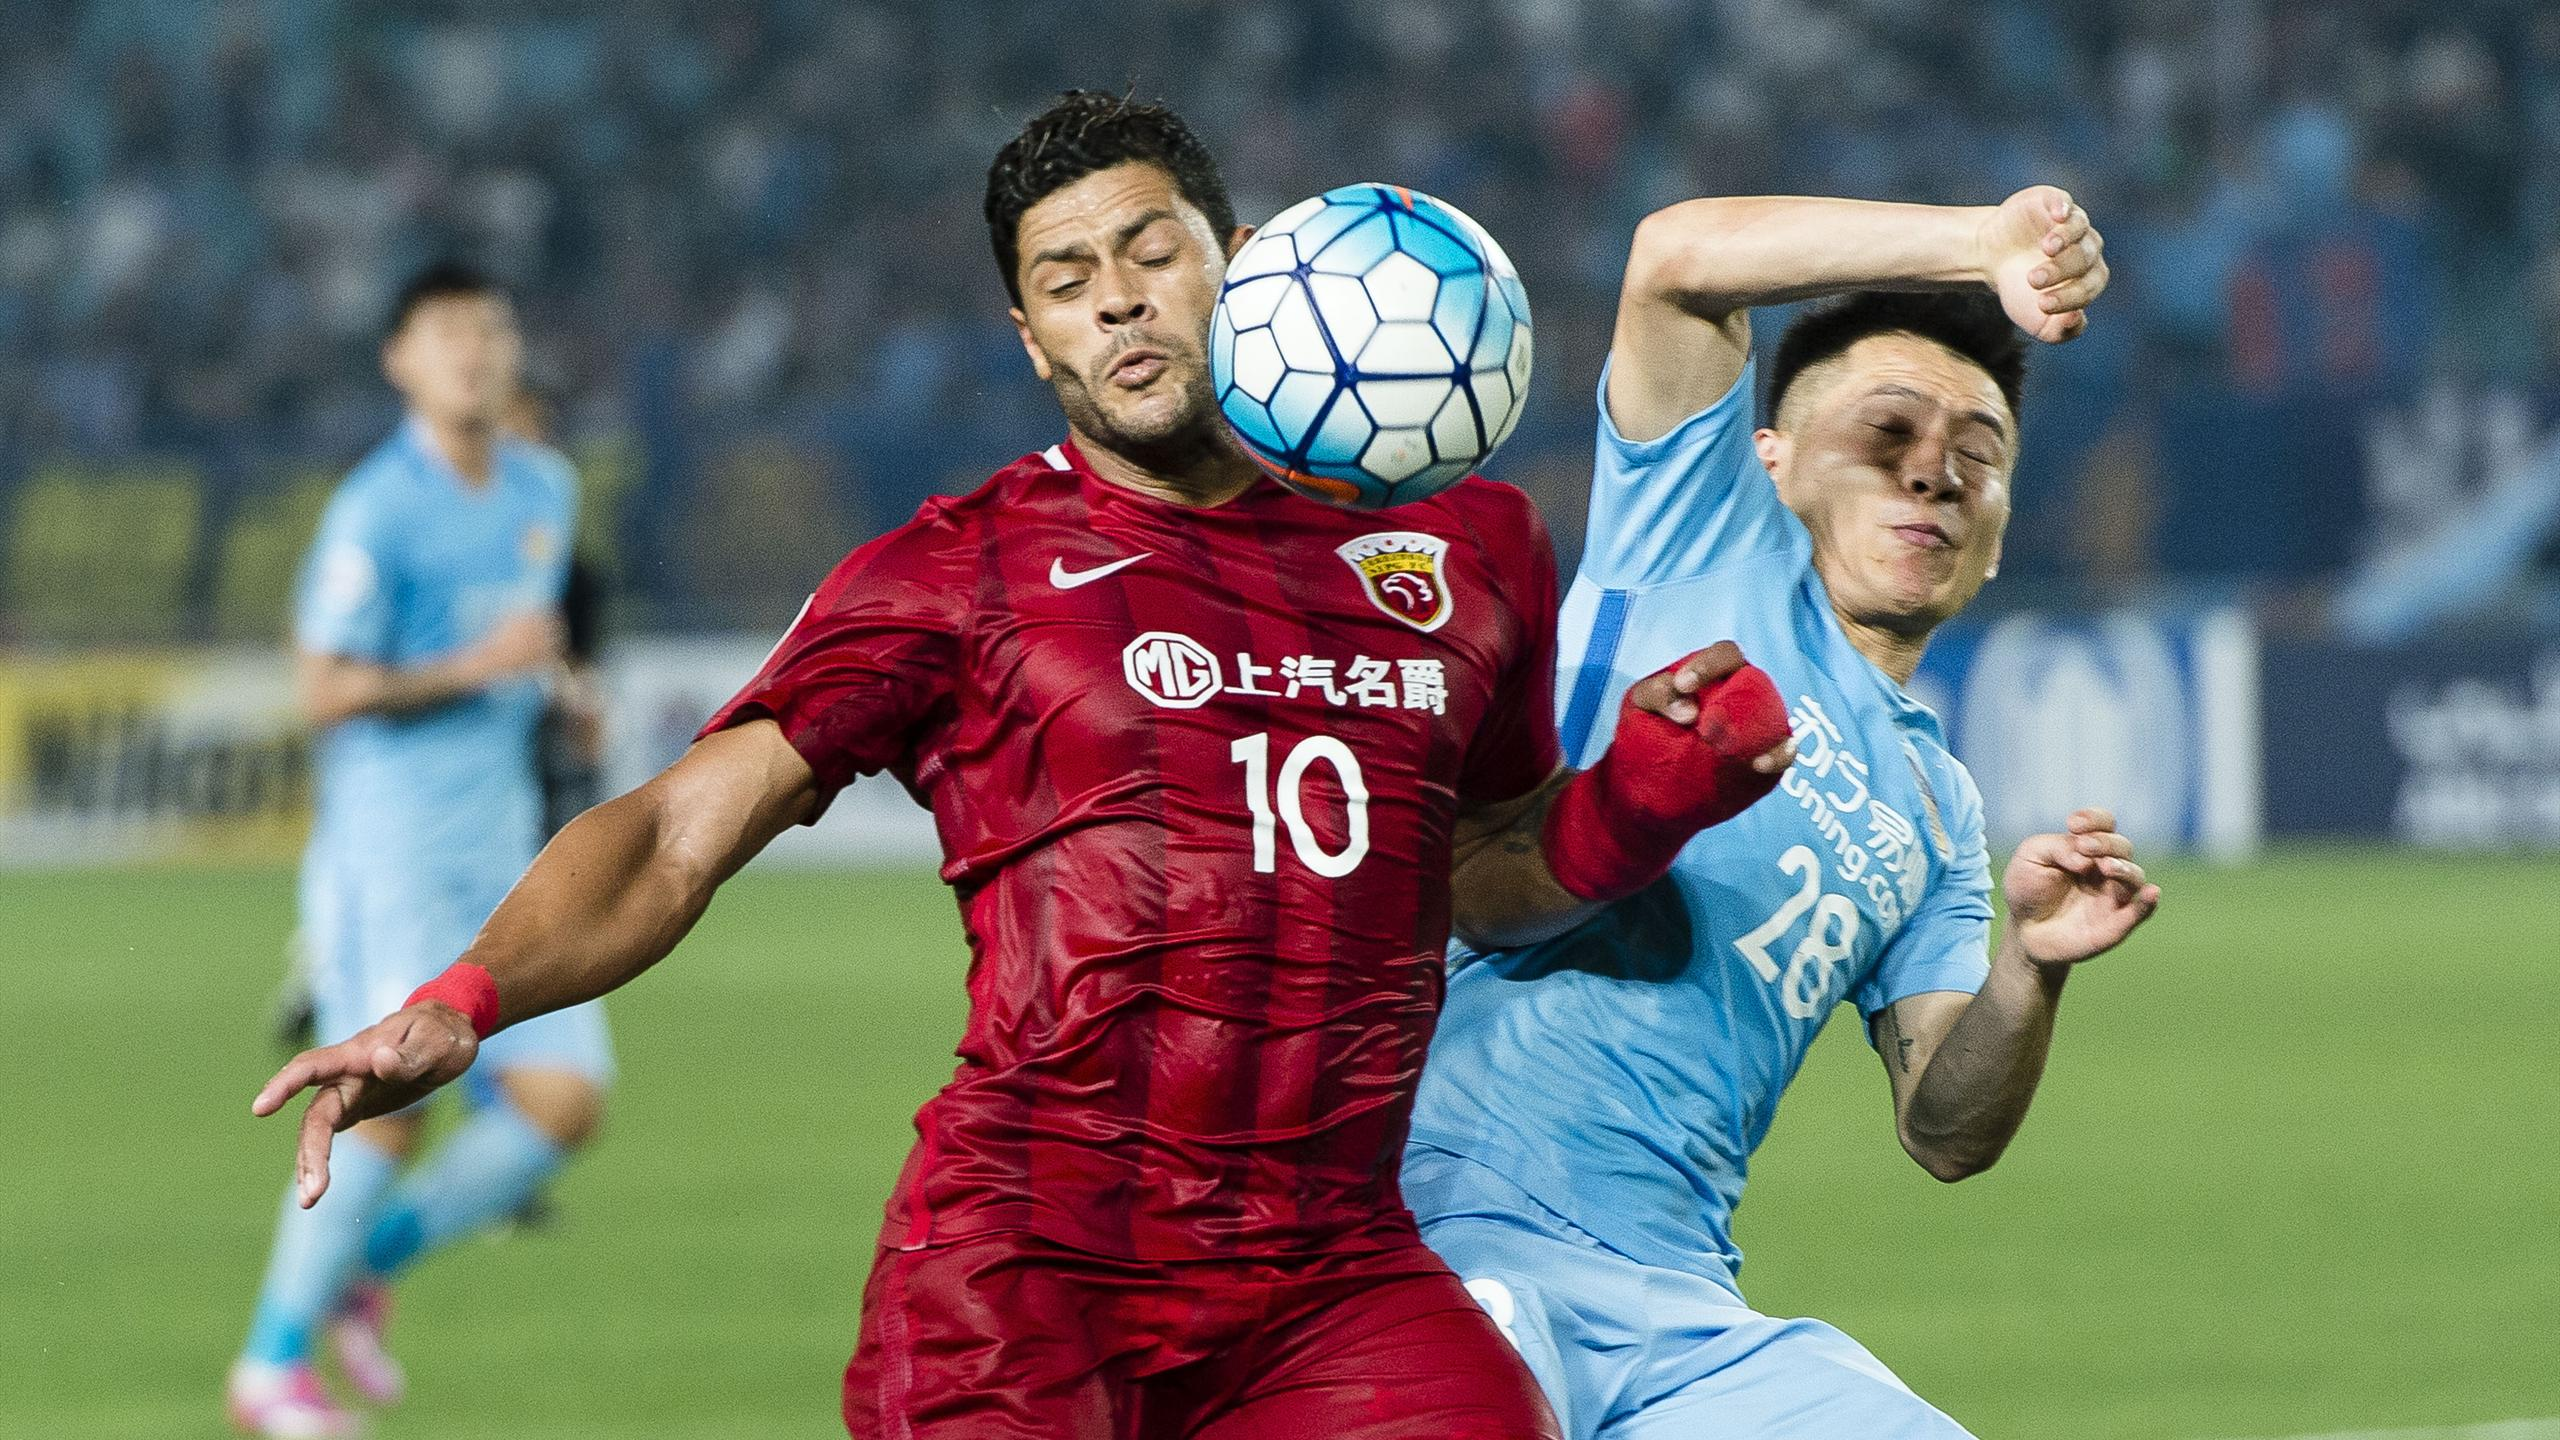 Ставок чемпионат китая 3 дивизион футбол ставки беларусь